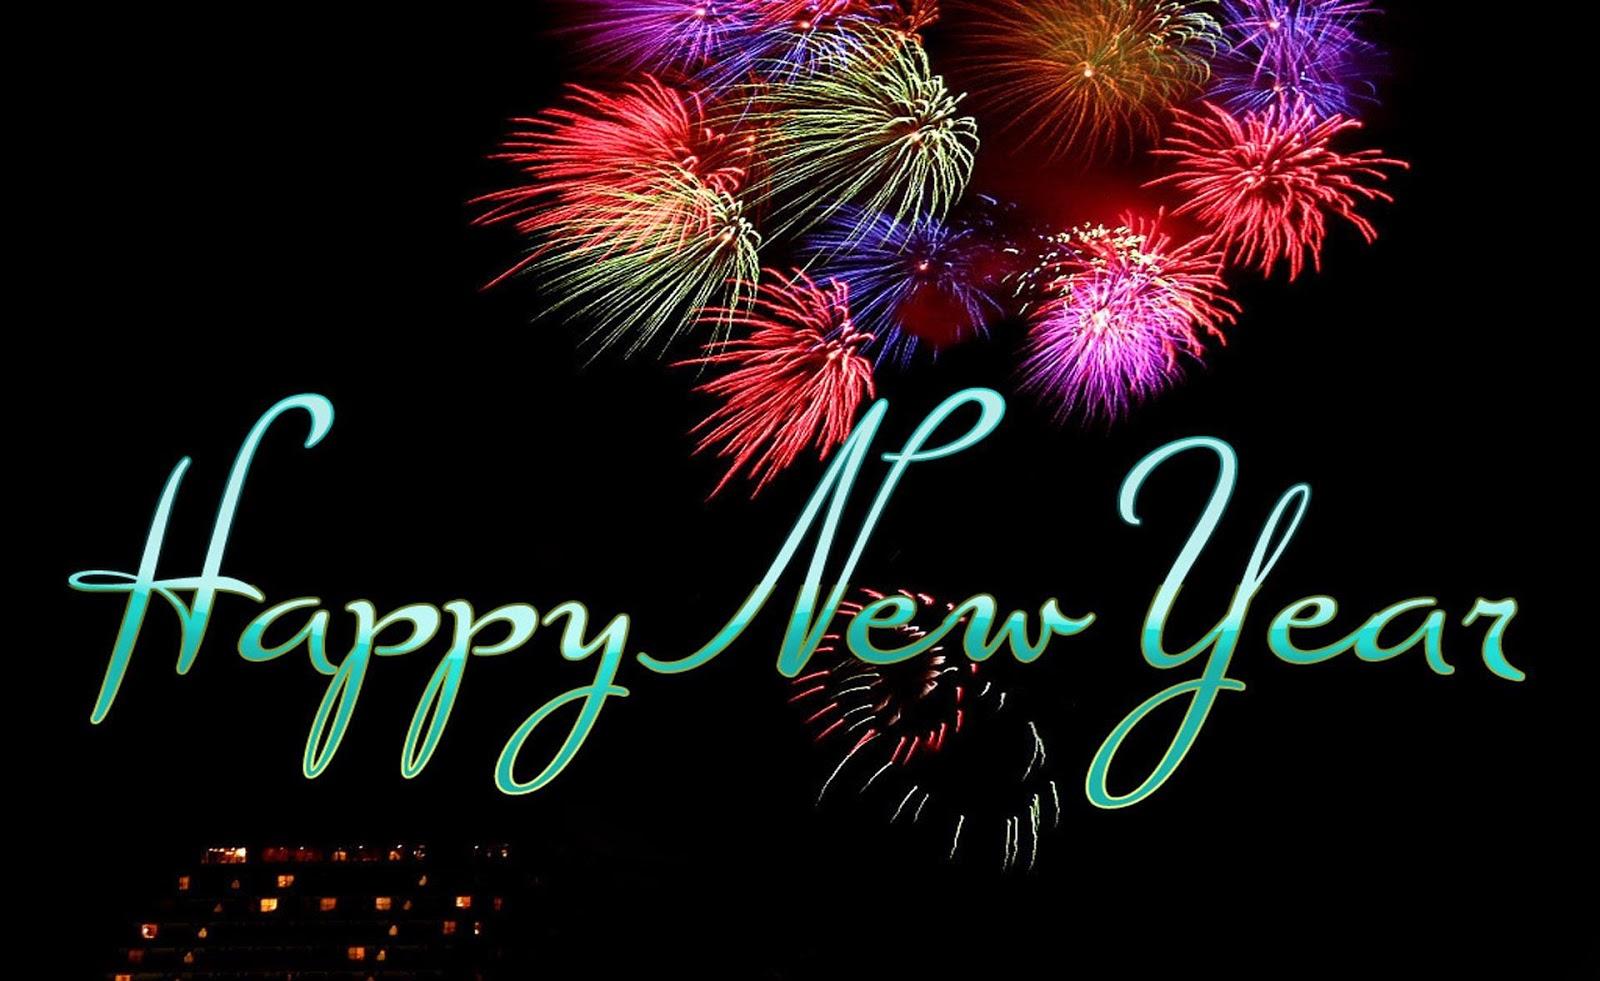 Wonderful Happy New Year Celebration Wallpaper 2018